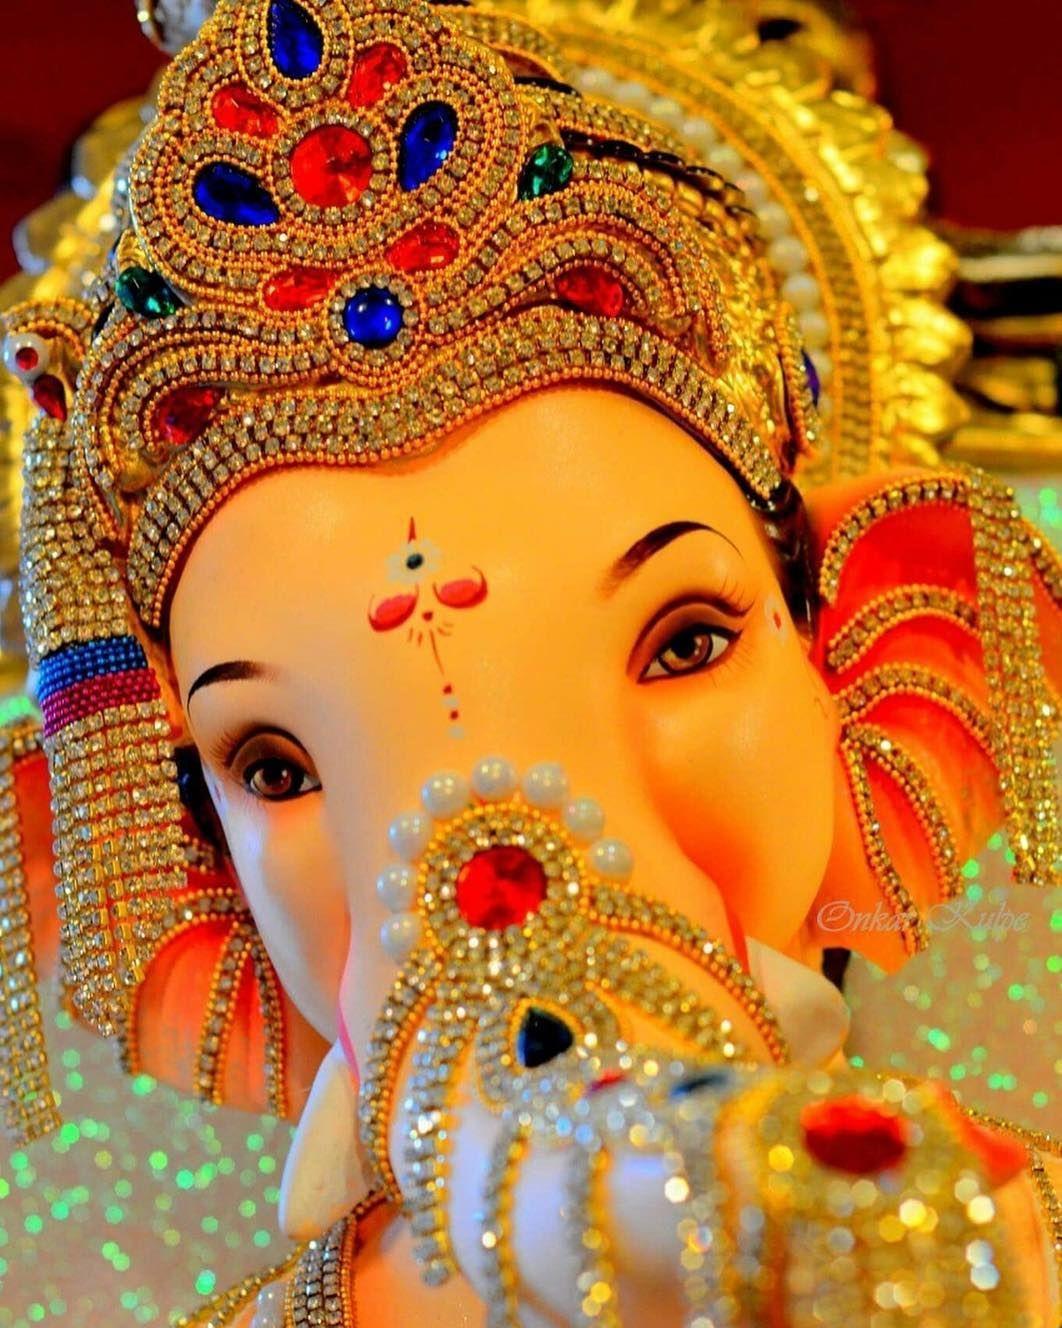 310 Ganpati Bappa Images Free Download Full Hd Pics Photo Gallery And Wallpapers 2019 Happy New Ye Ganesh Lord Ganesh Idol Happy Ganesh Chaturthi Images Ganpati wallpaper hd download